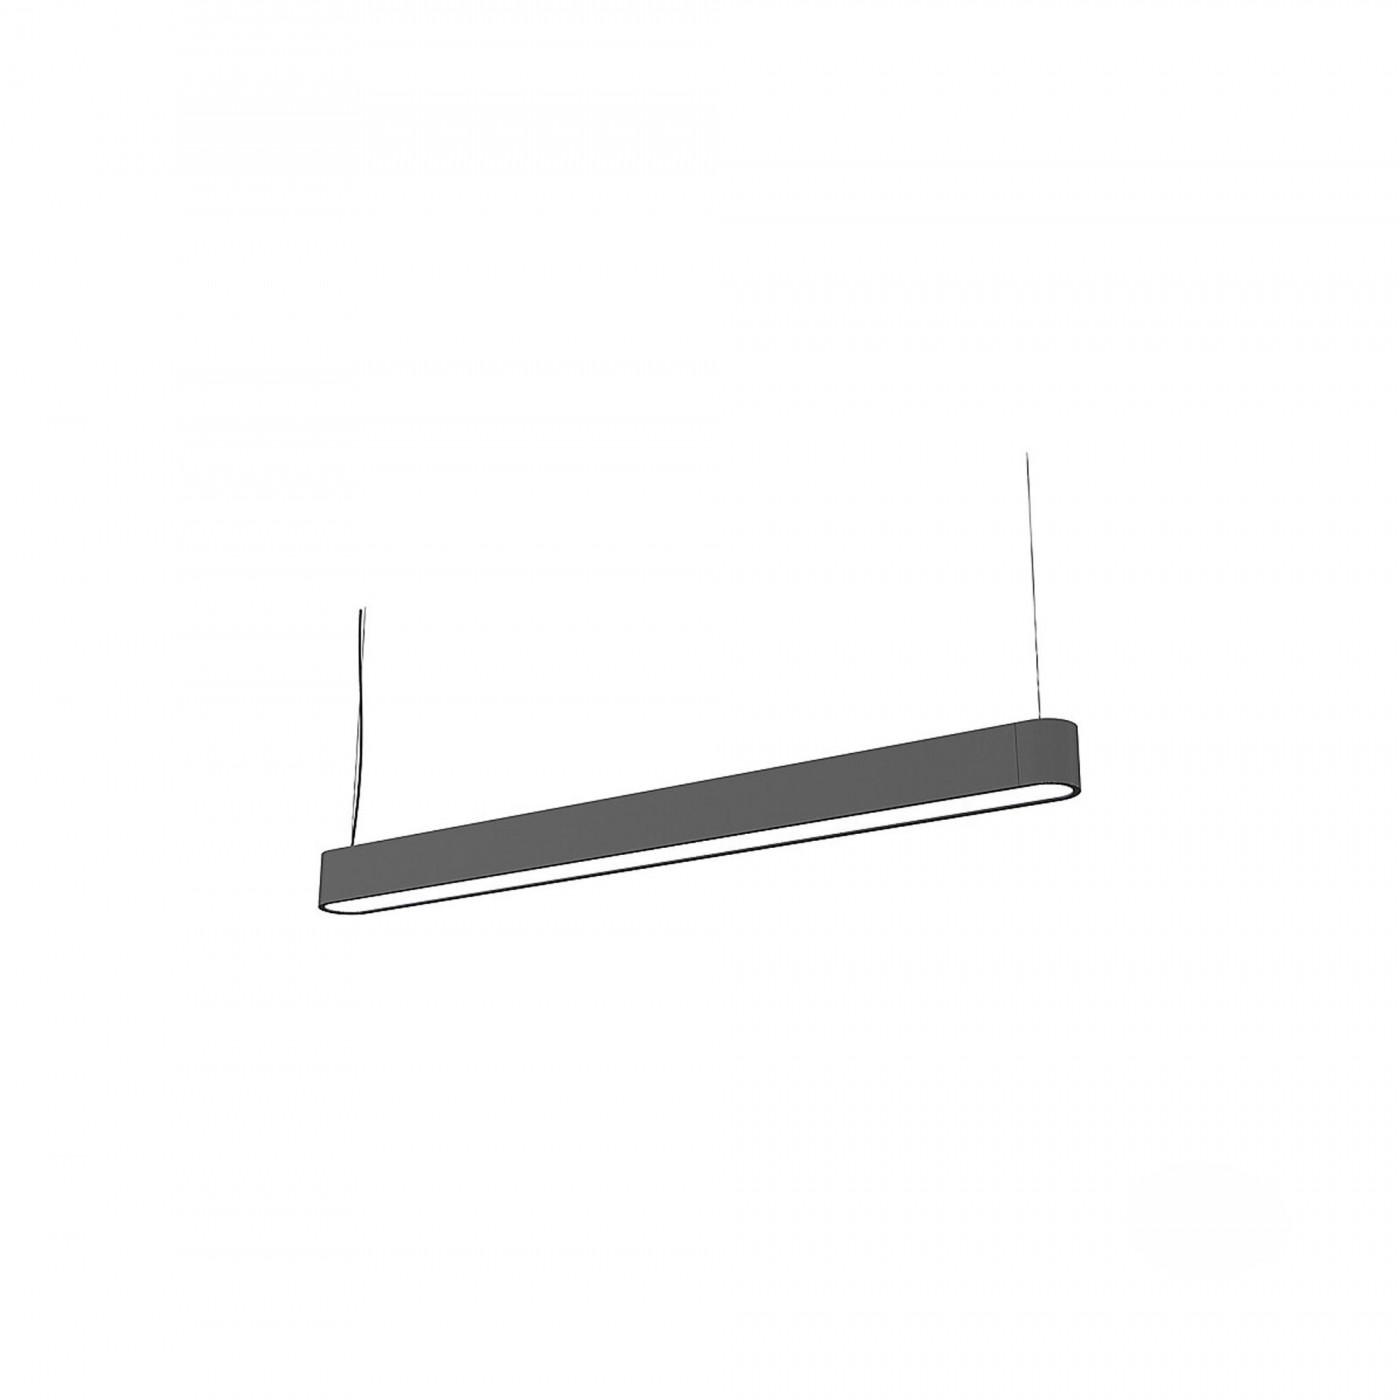 SOFT LED graphite 120x6  9543 Nowodvorski